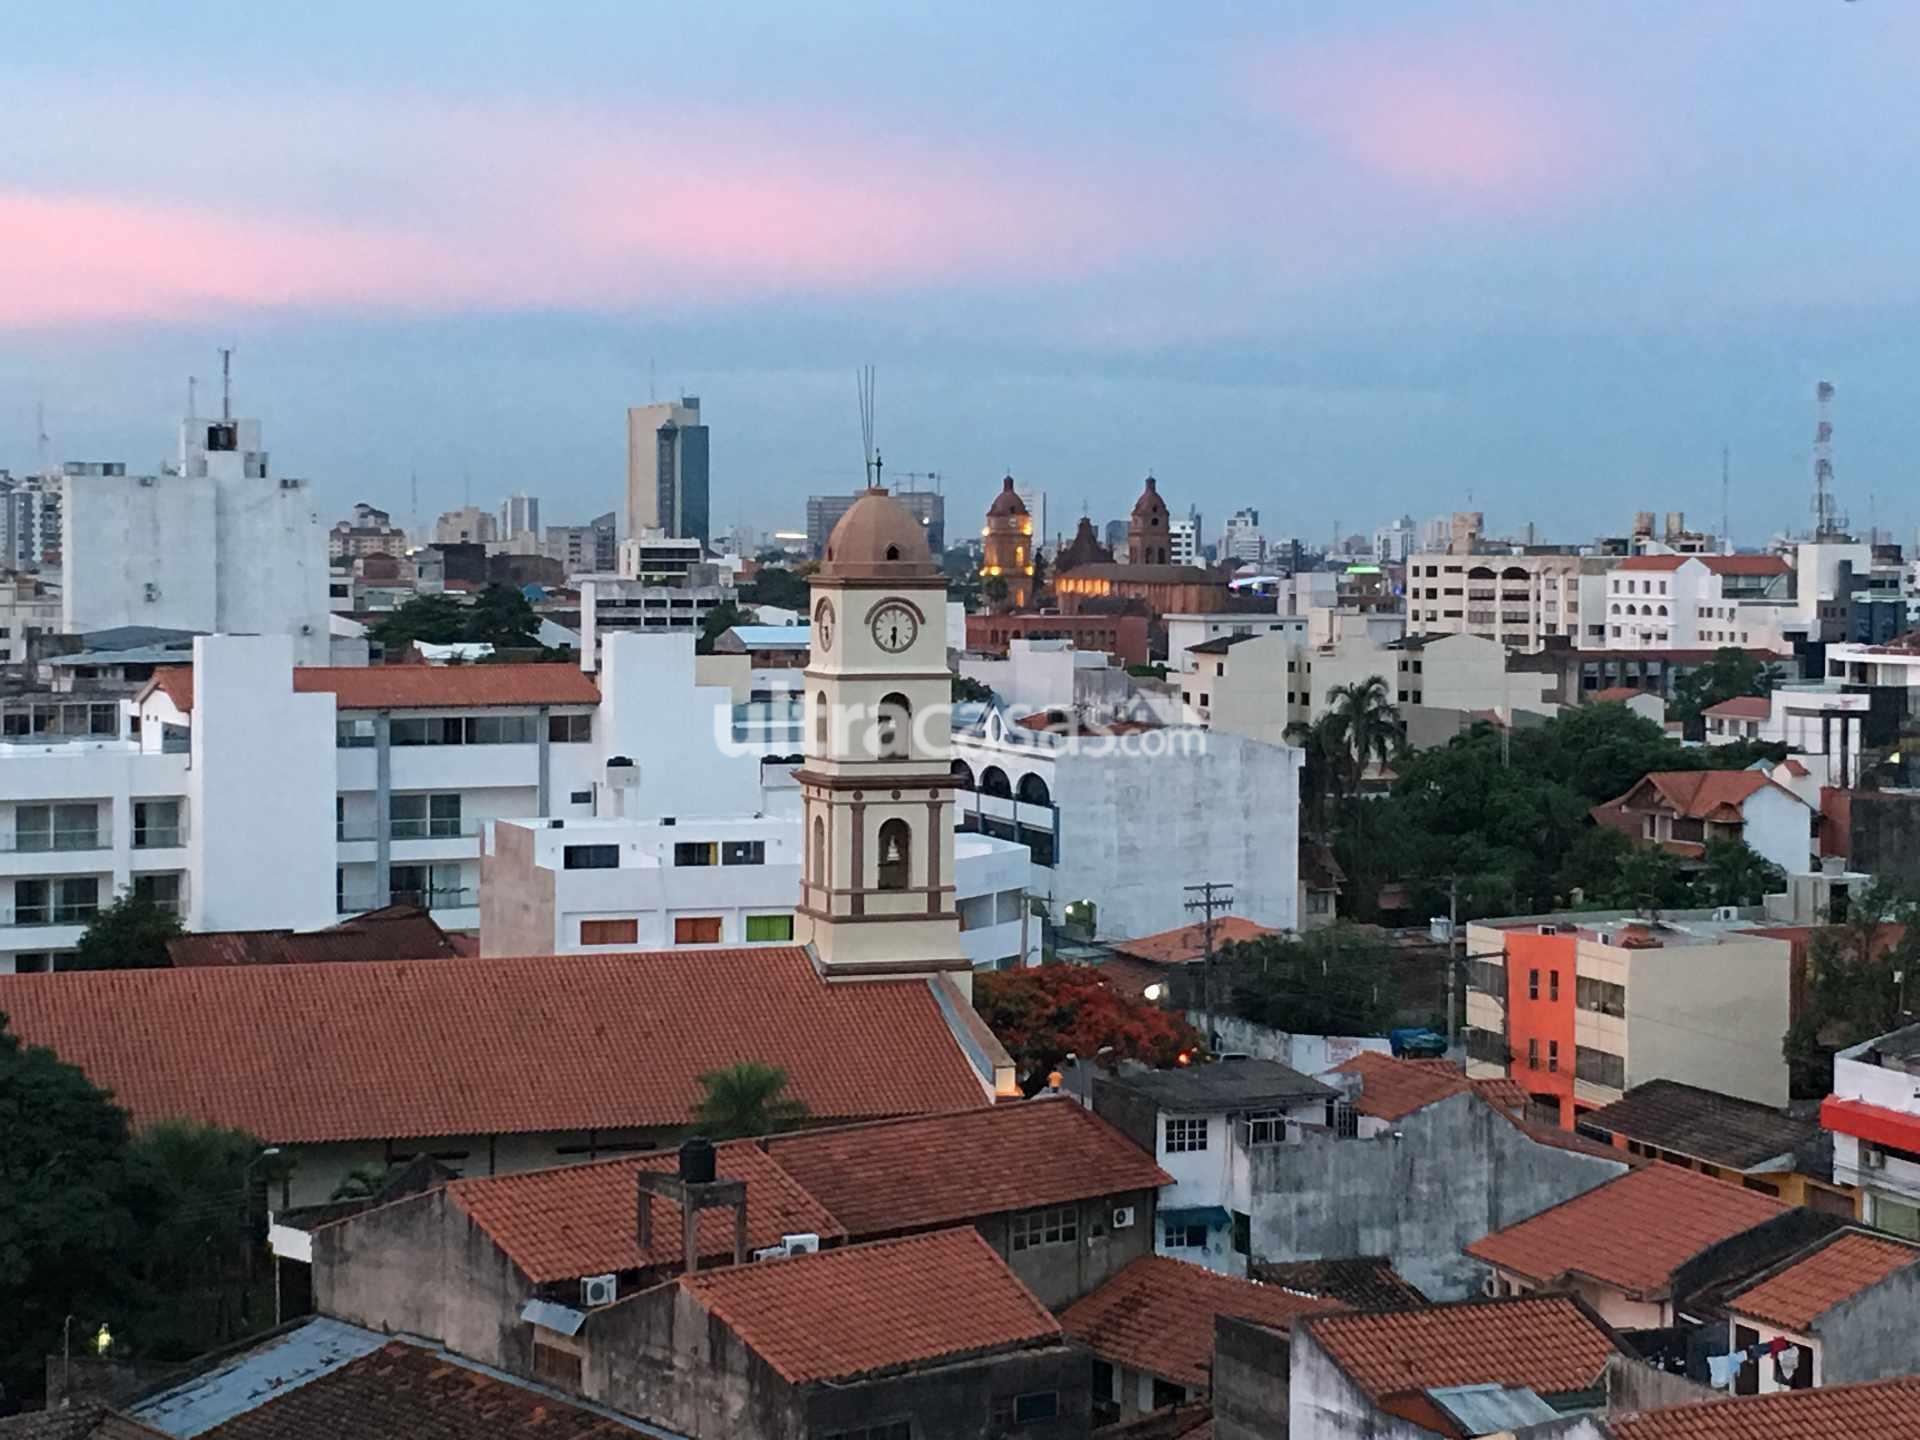 Departamento en Venta Calle Velasco, a una cuadra de la Av. Irala Foto 6